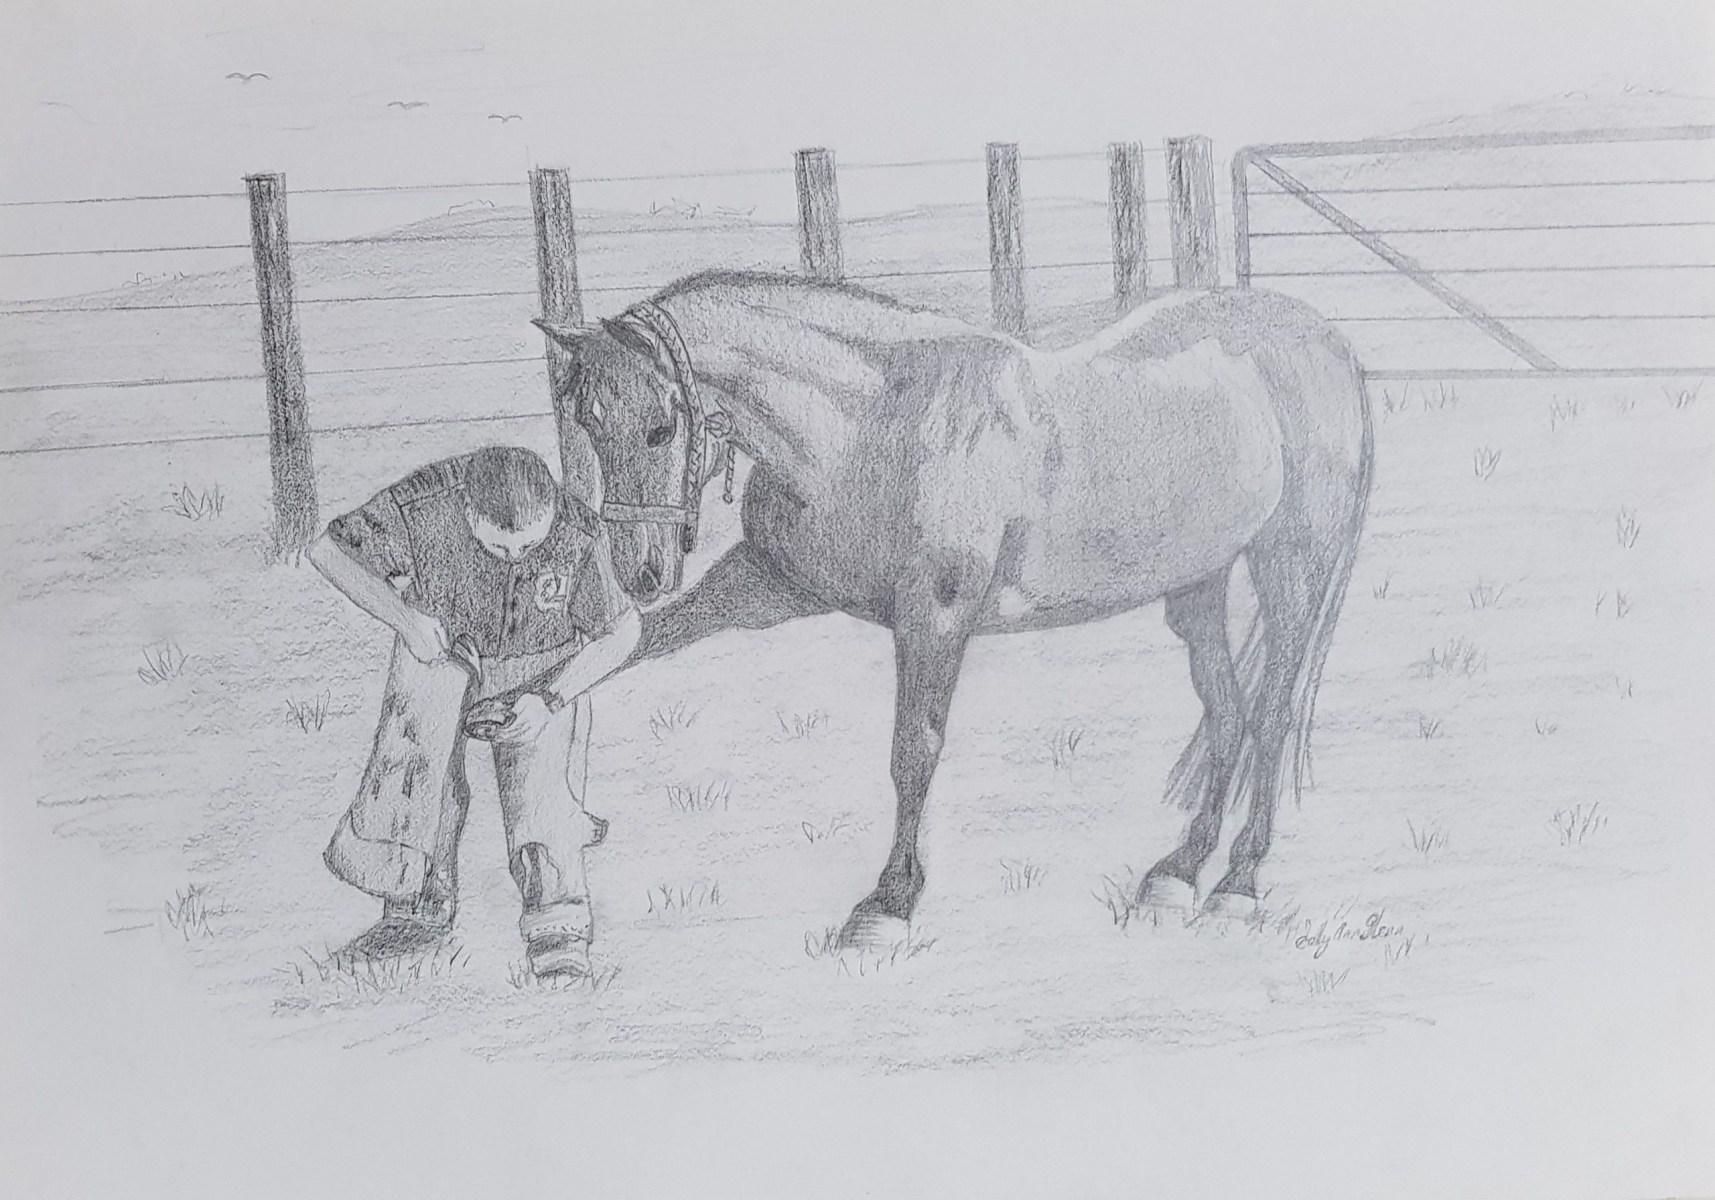 A Man Fixing His Horse's Shoe - Sally Ann Glenn